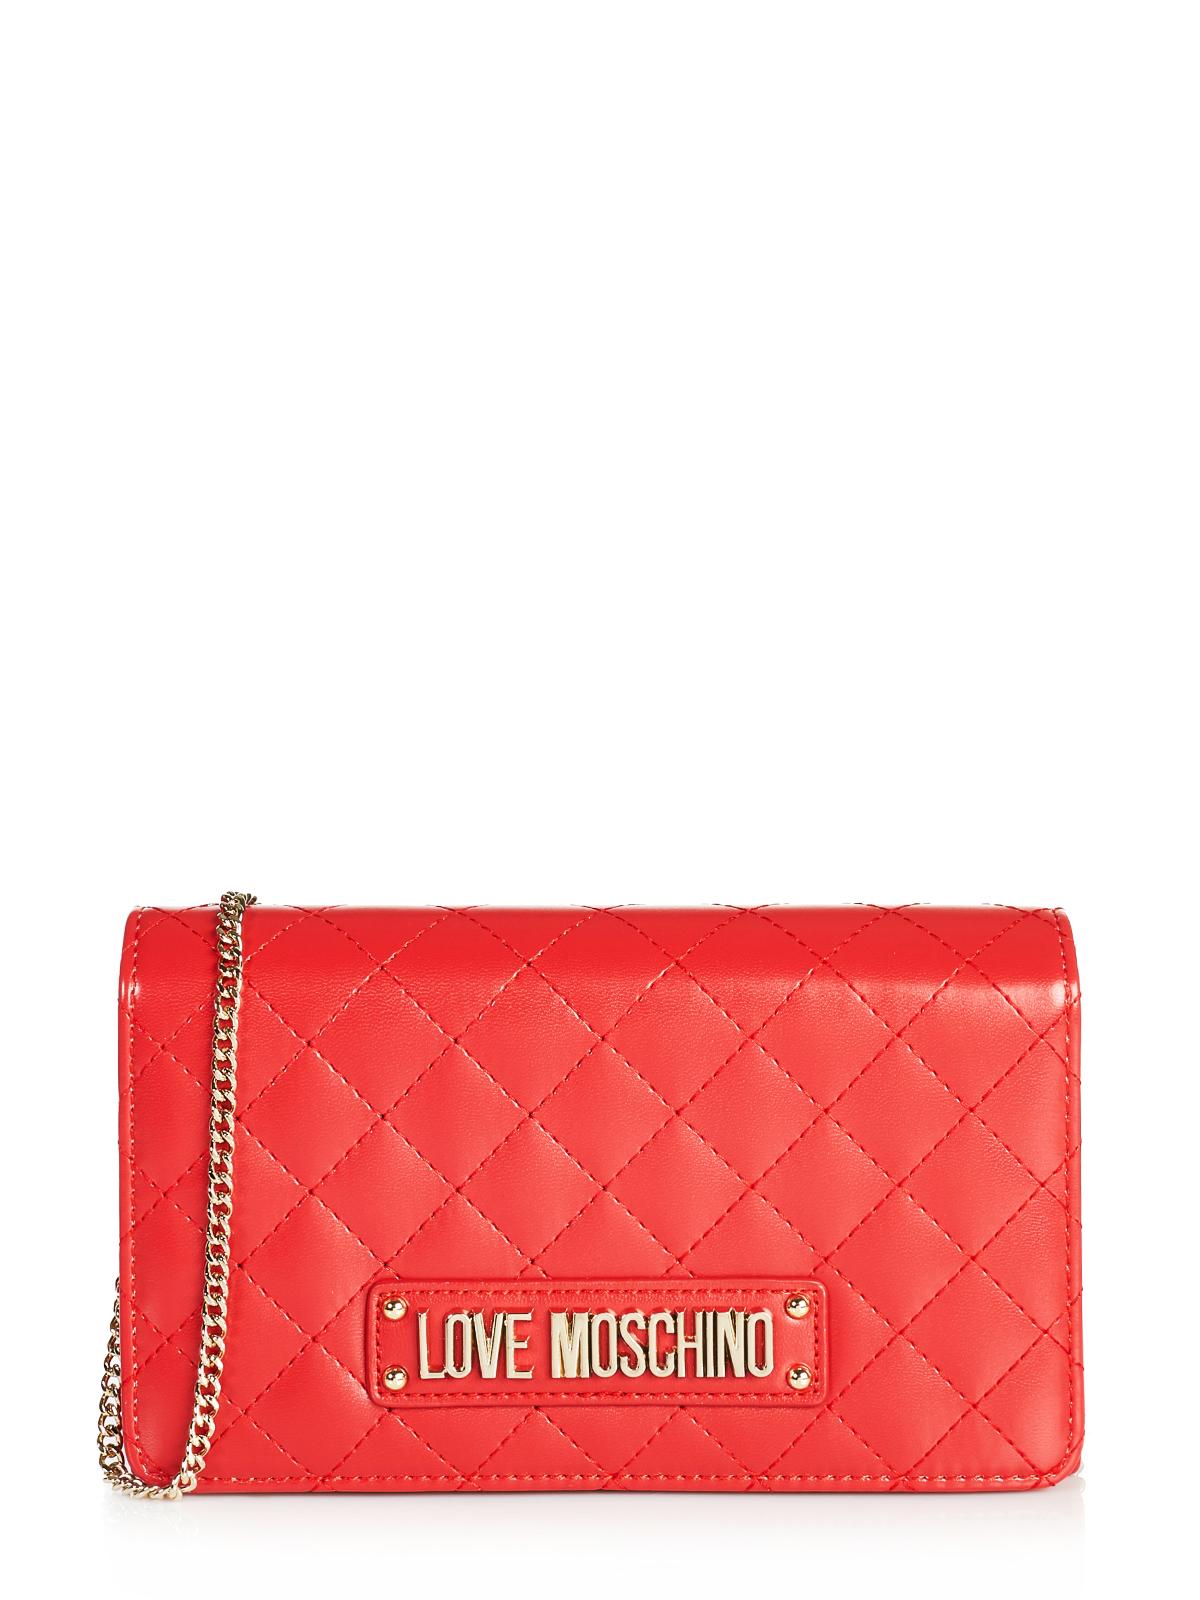 f508fc66b8 Love Moschino bag red | Fashionesta online shop